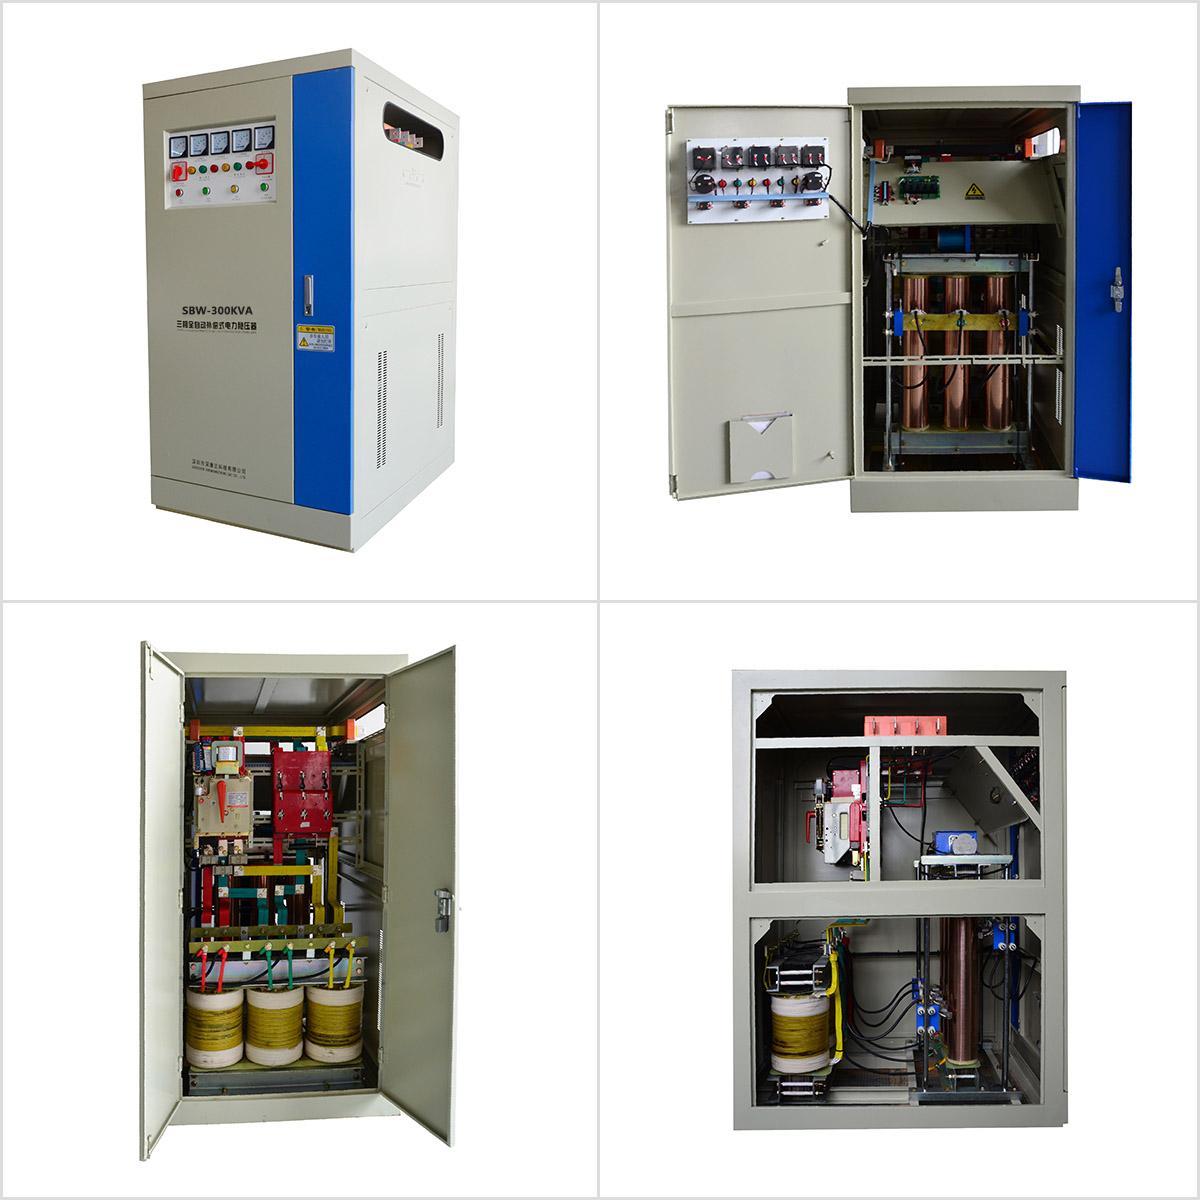 SBW Voltage Stabilizer 300KVA